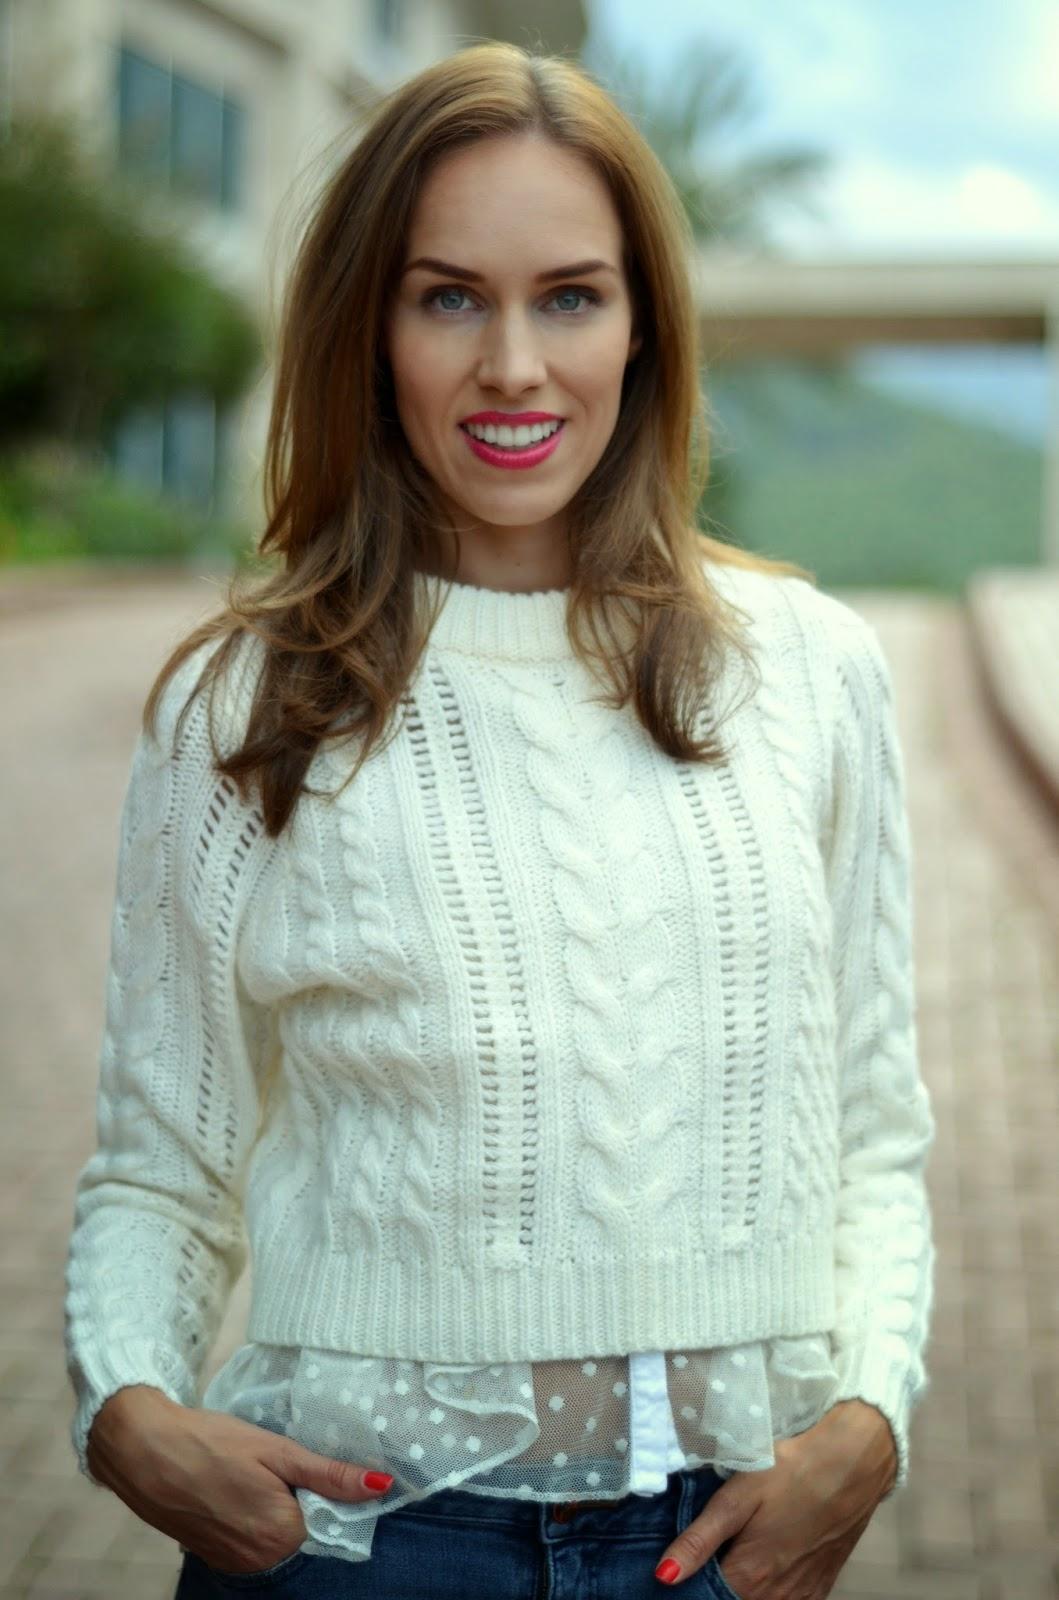 gina-tricot-white-jumper-knit-asos-sheer-blouse kristjaana mere